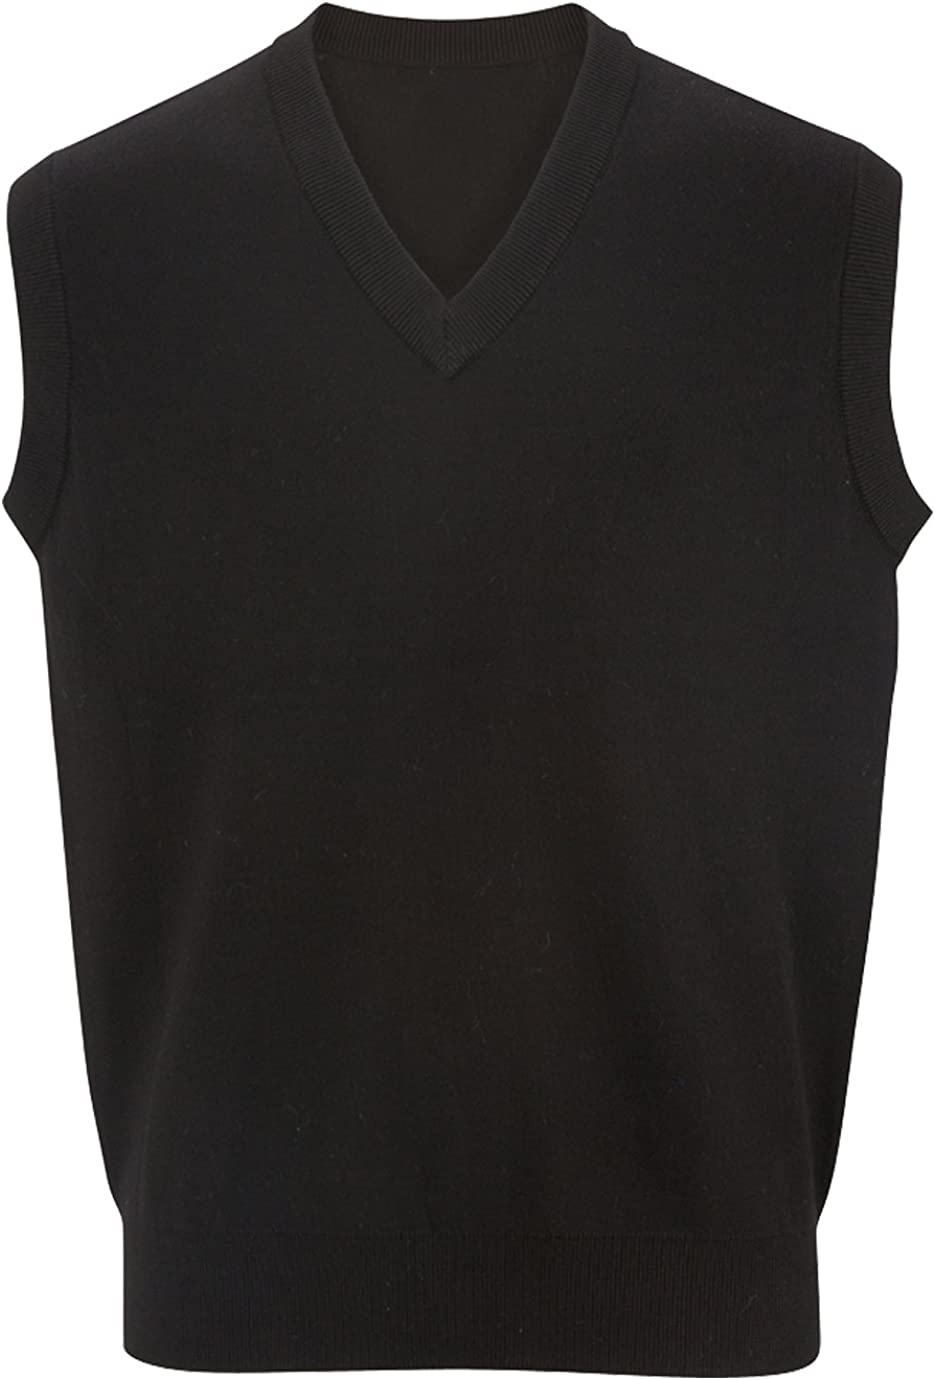 Ed Garments V-Neck Cotton Sweater Vest